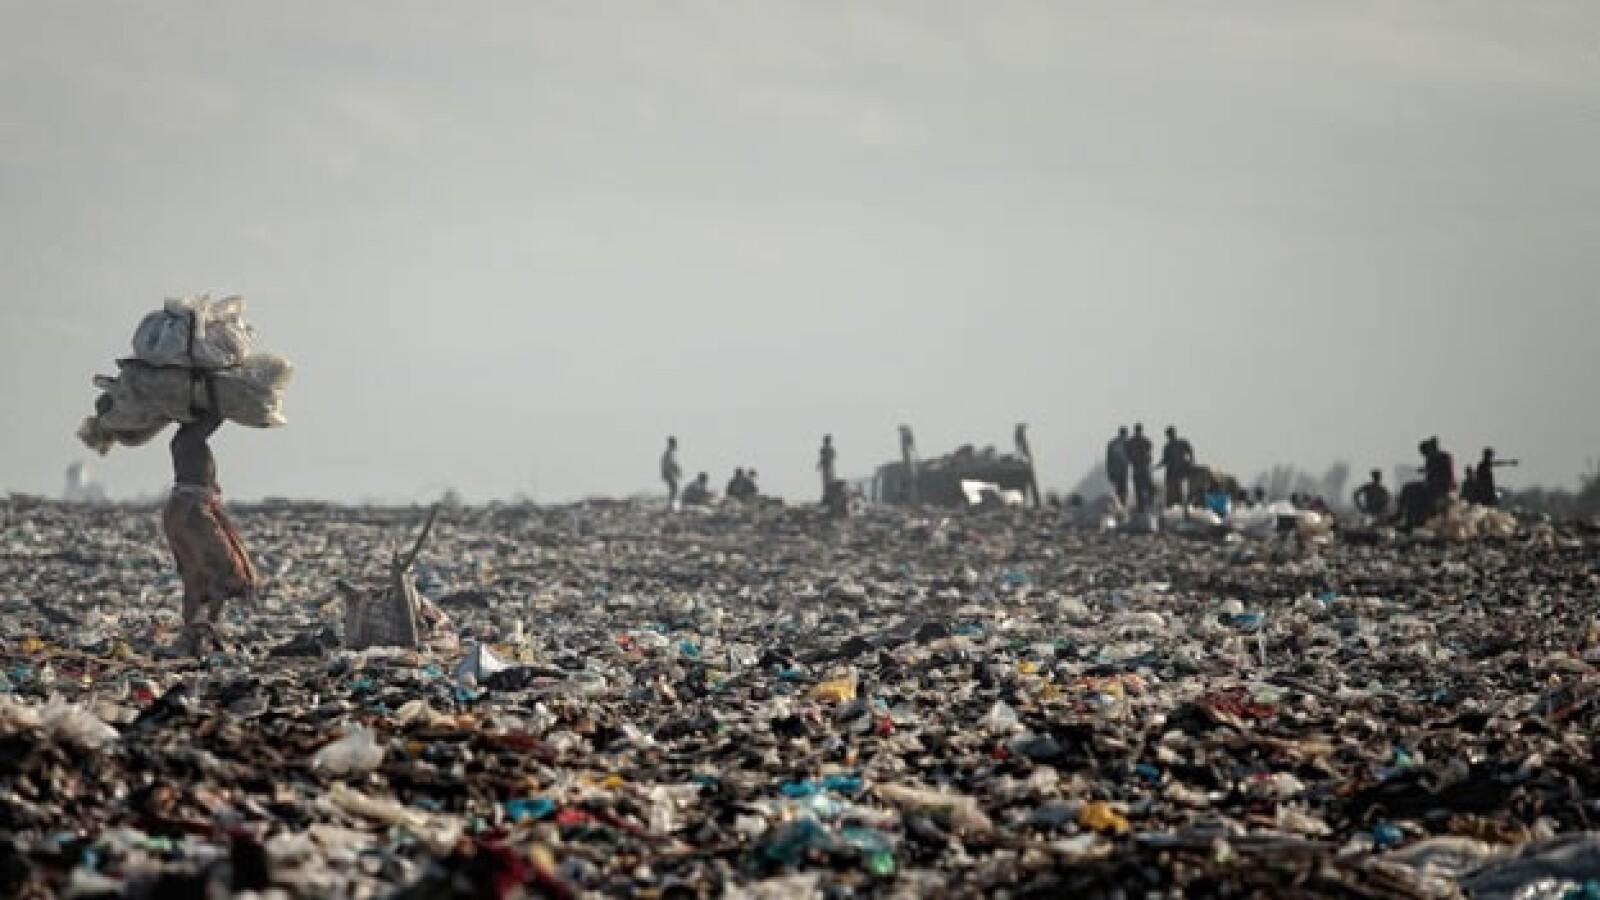 mozambique basurero hulene 05